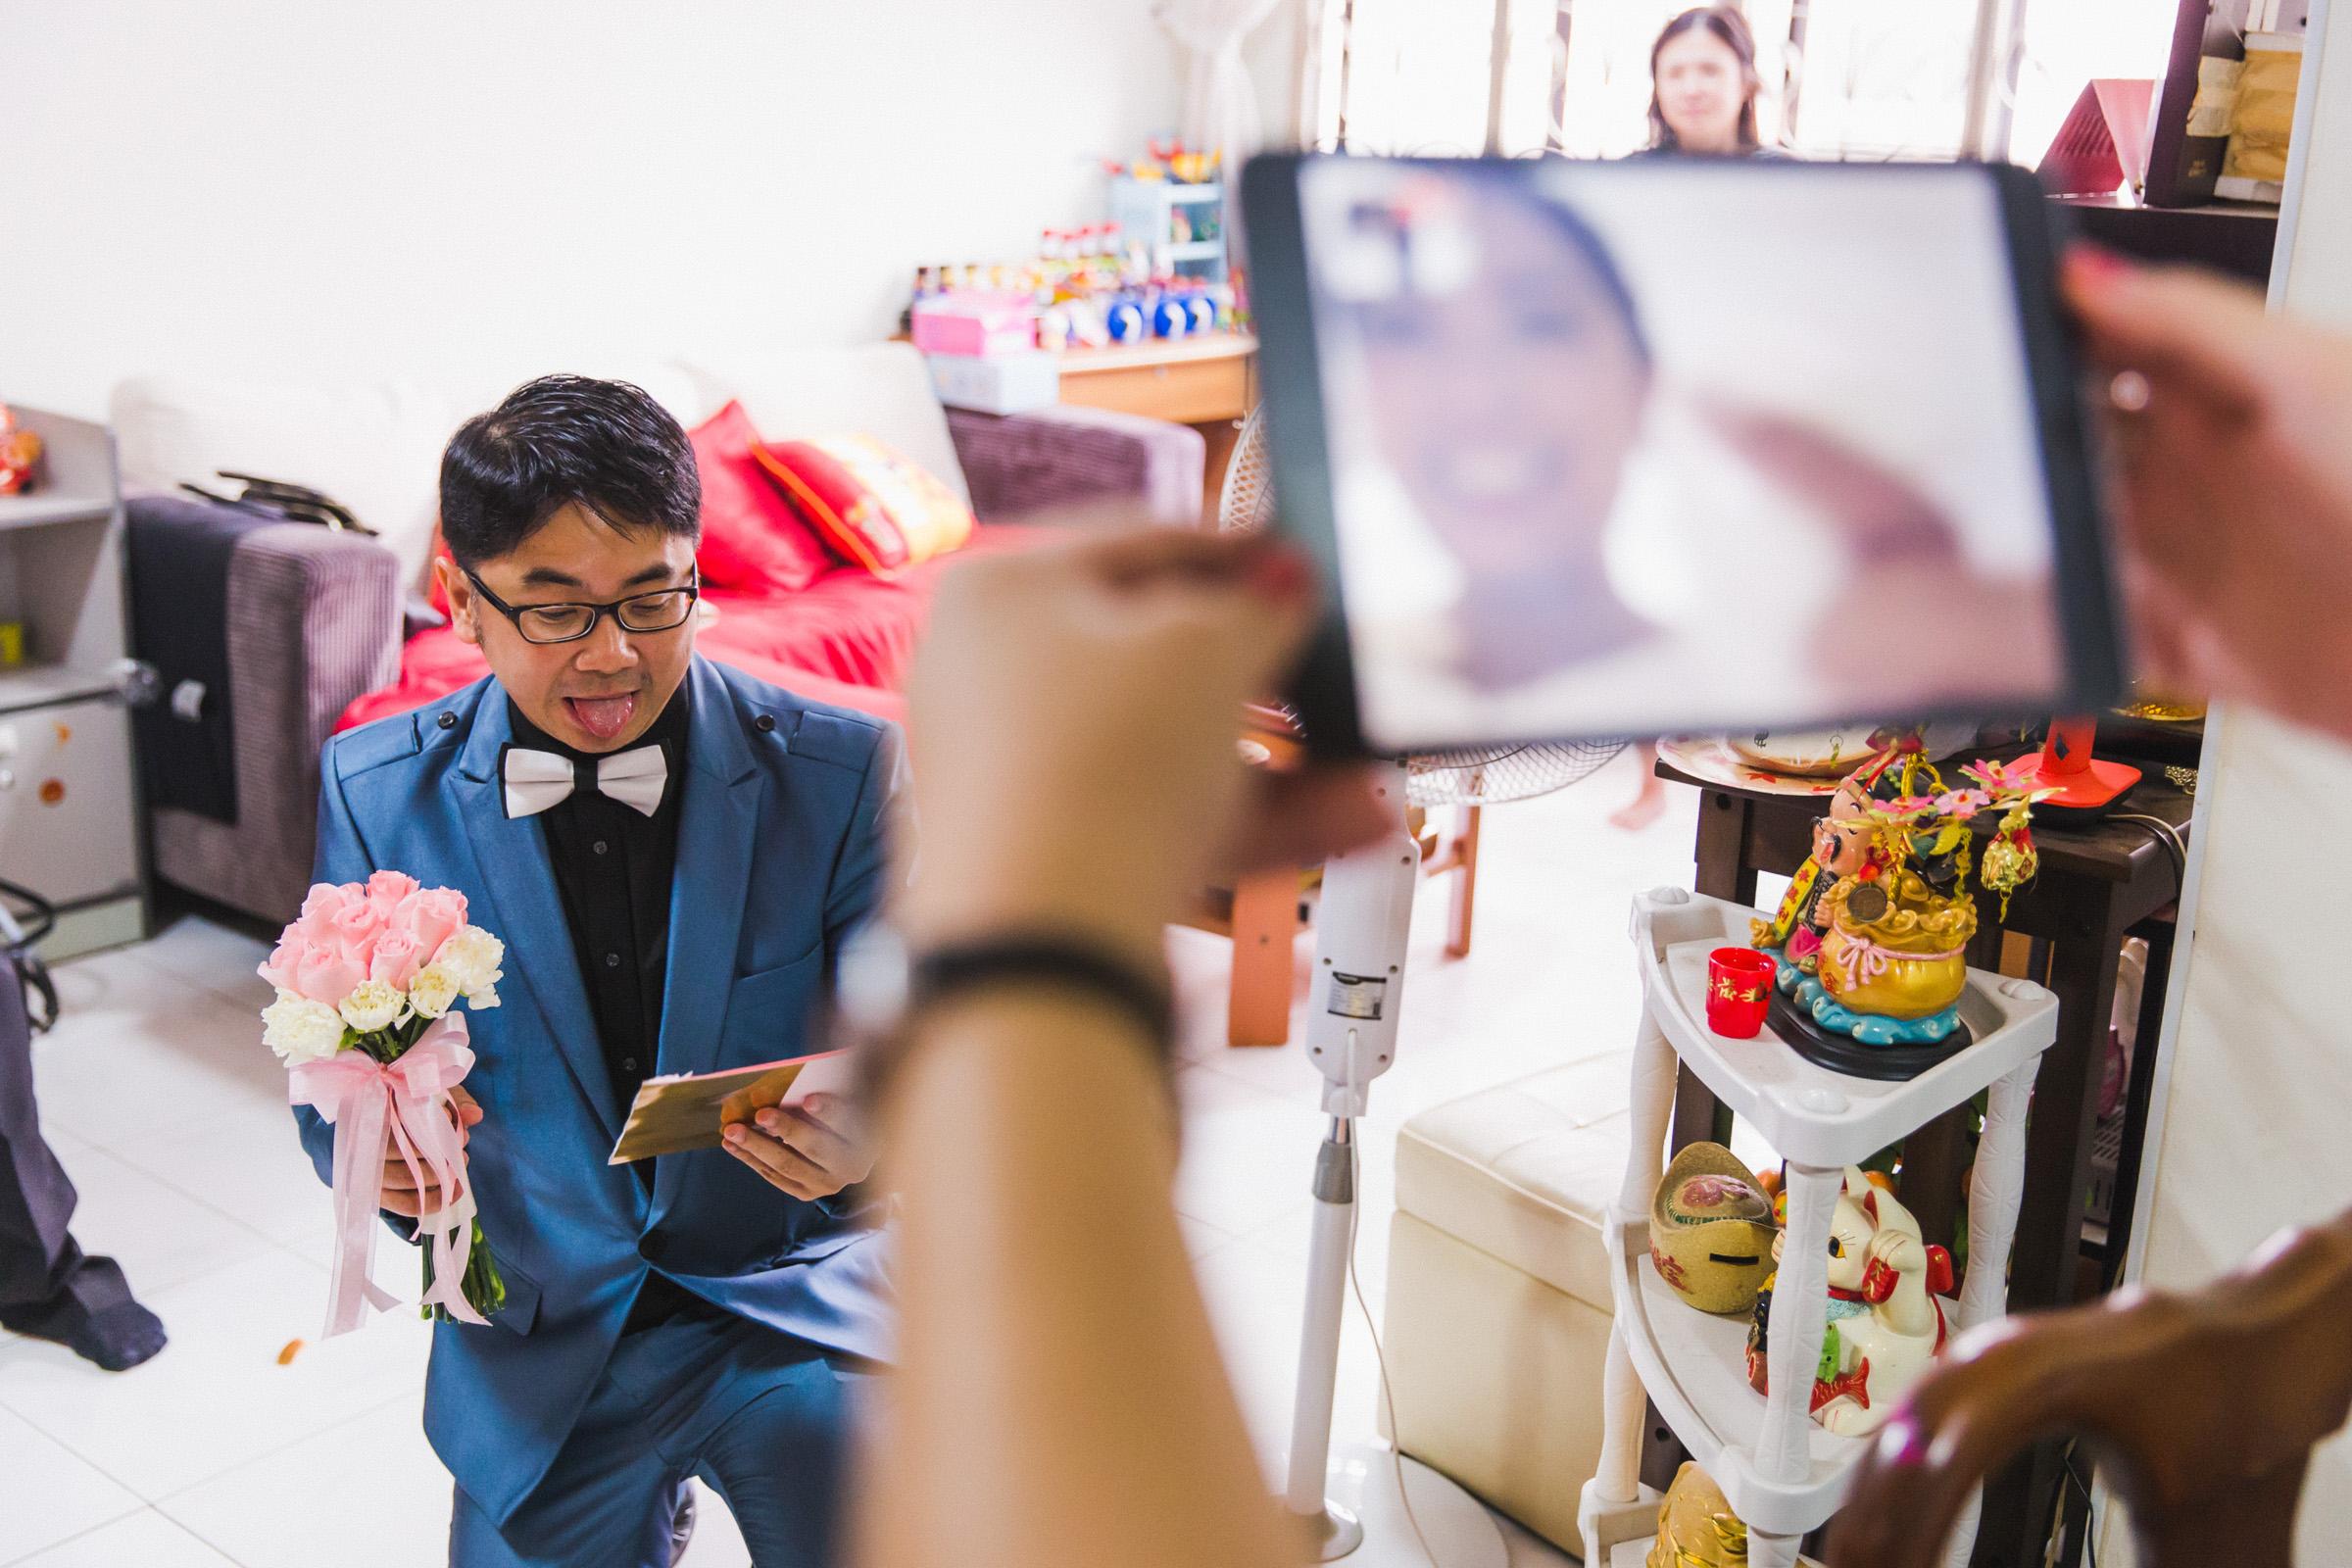 Steven_Jasmine_Wedding_Walldrobe Photography_Wedding shoots_Actual day wedding_Photographer (13)